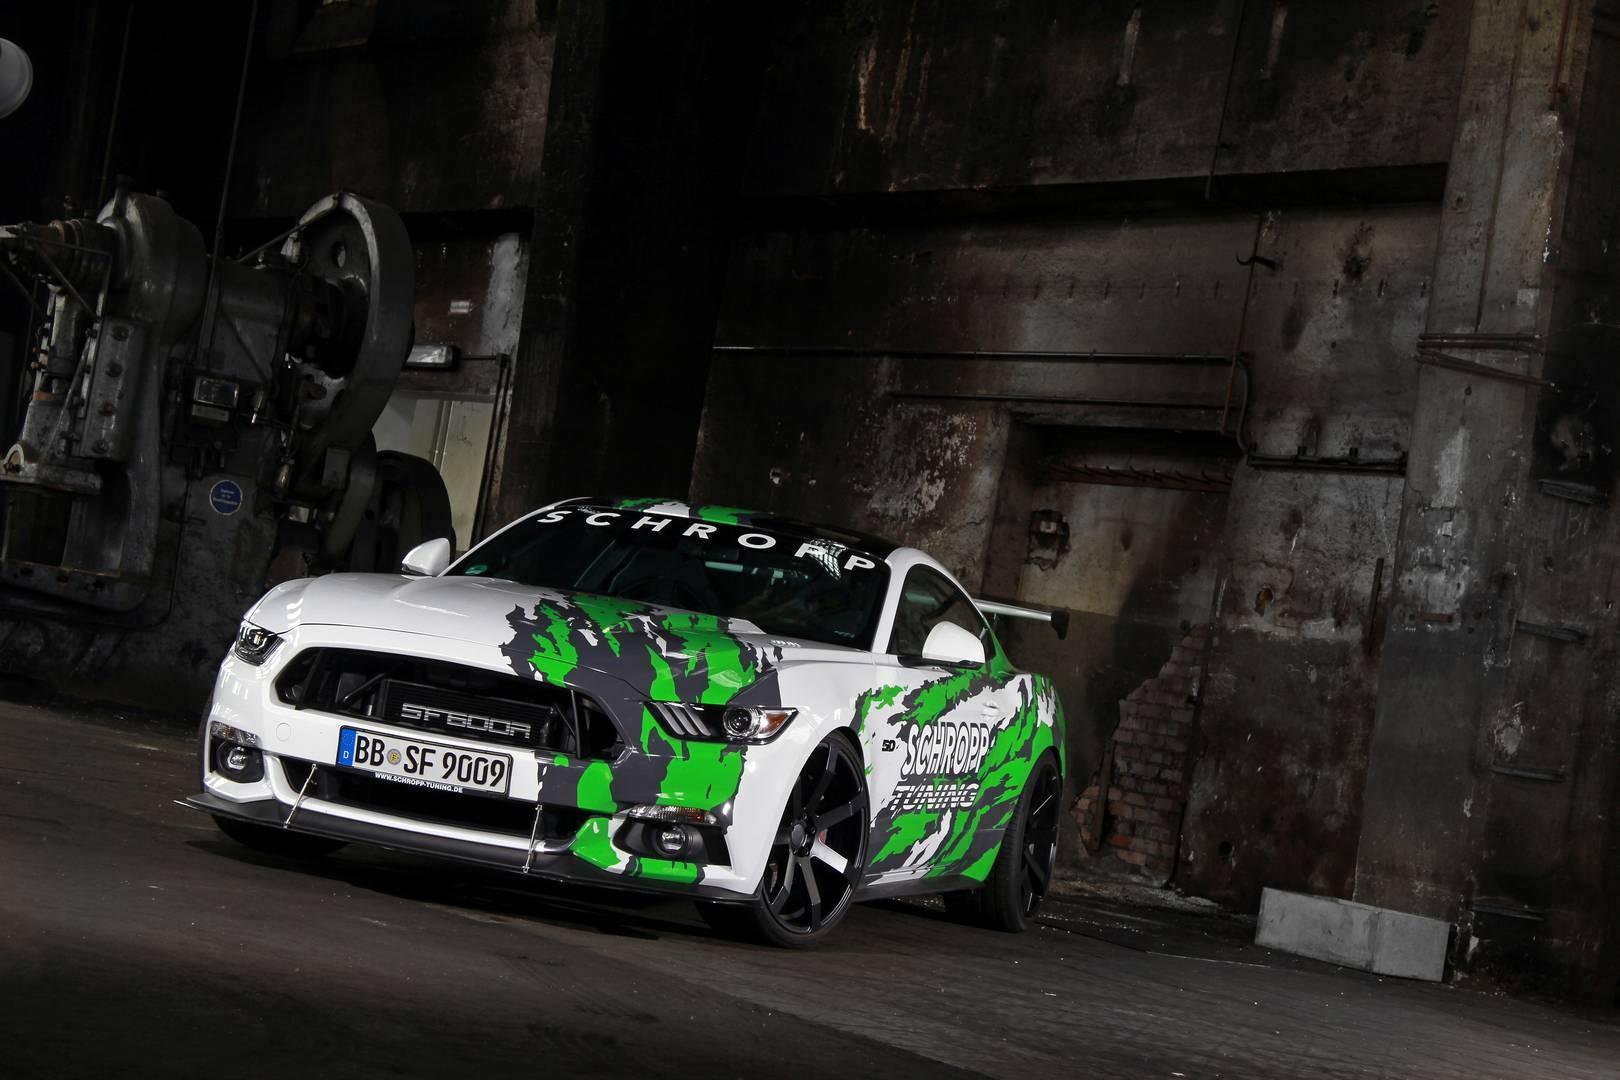 福特Mustang SF600R by Schropp